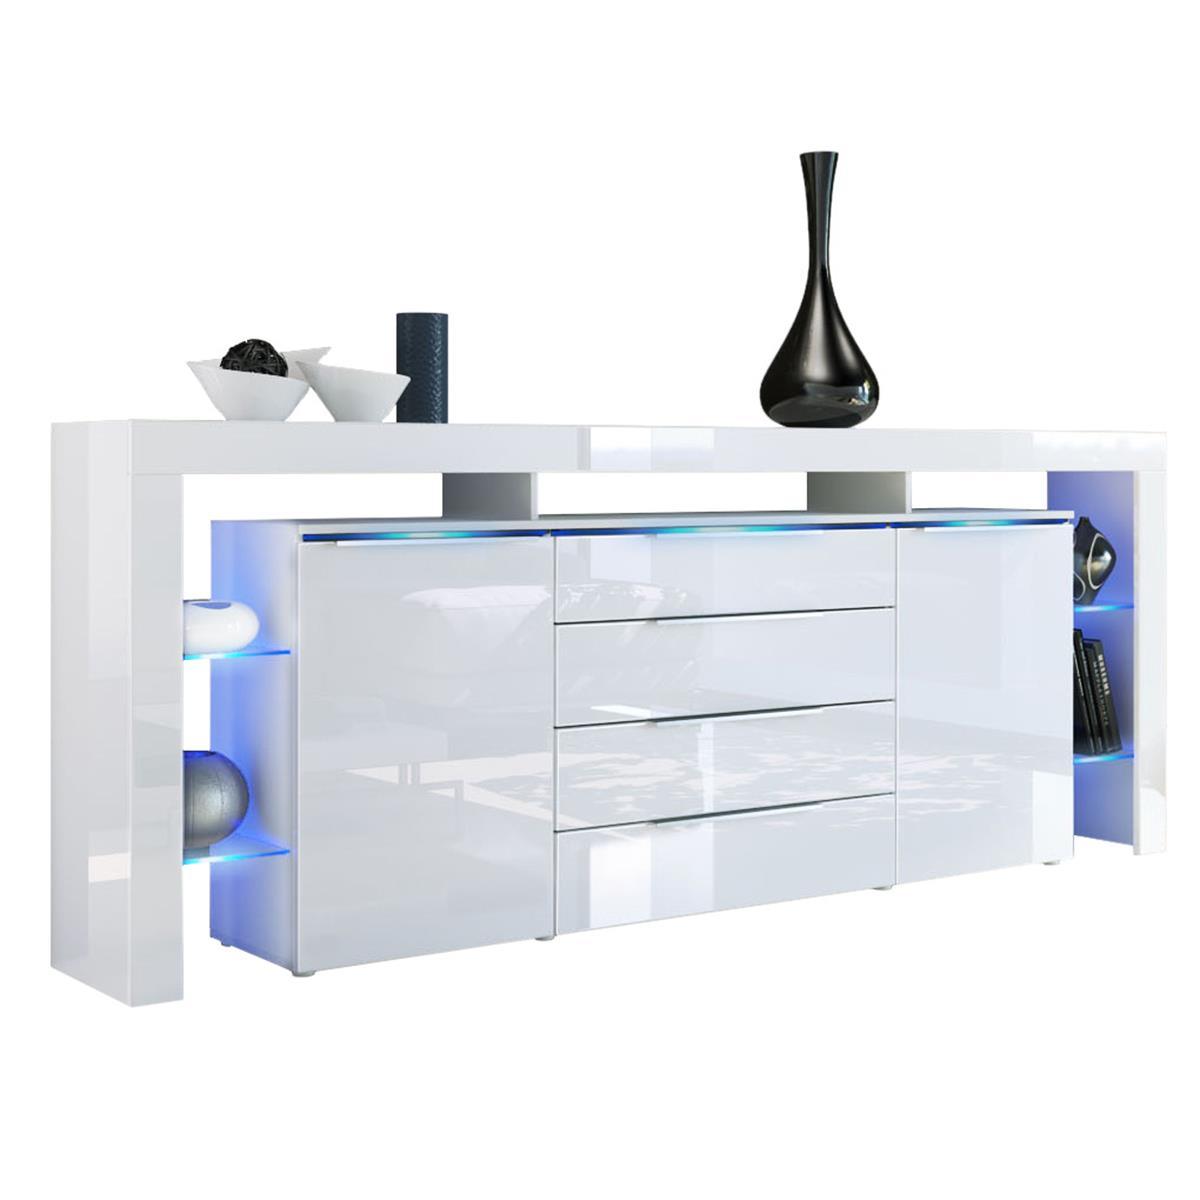 Sideboard Lima Nova V2 mit Regalaufbau & Glaselemente